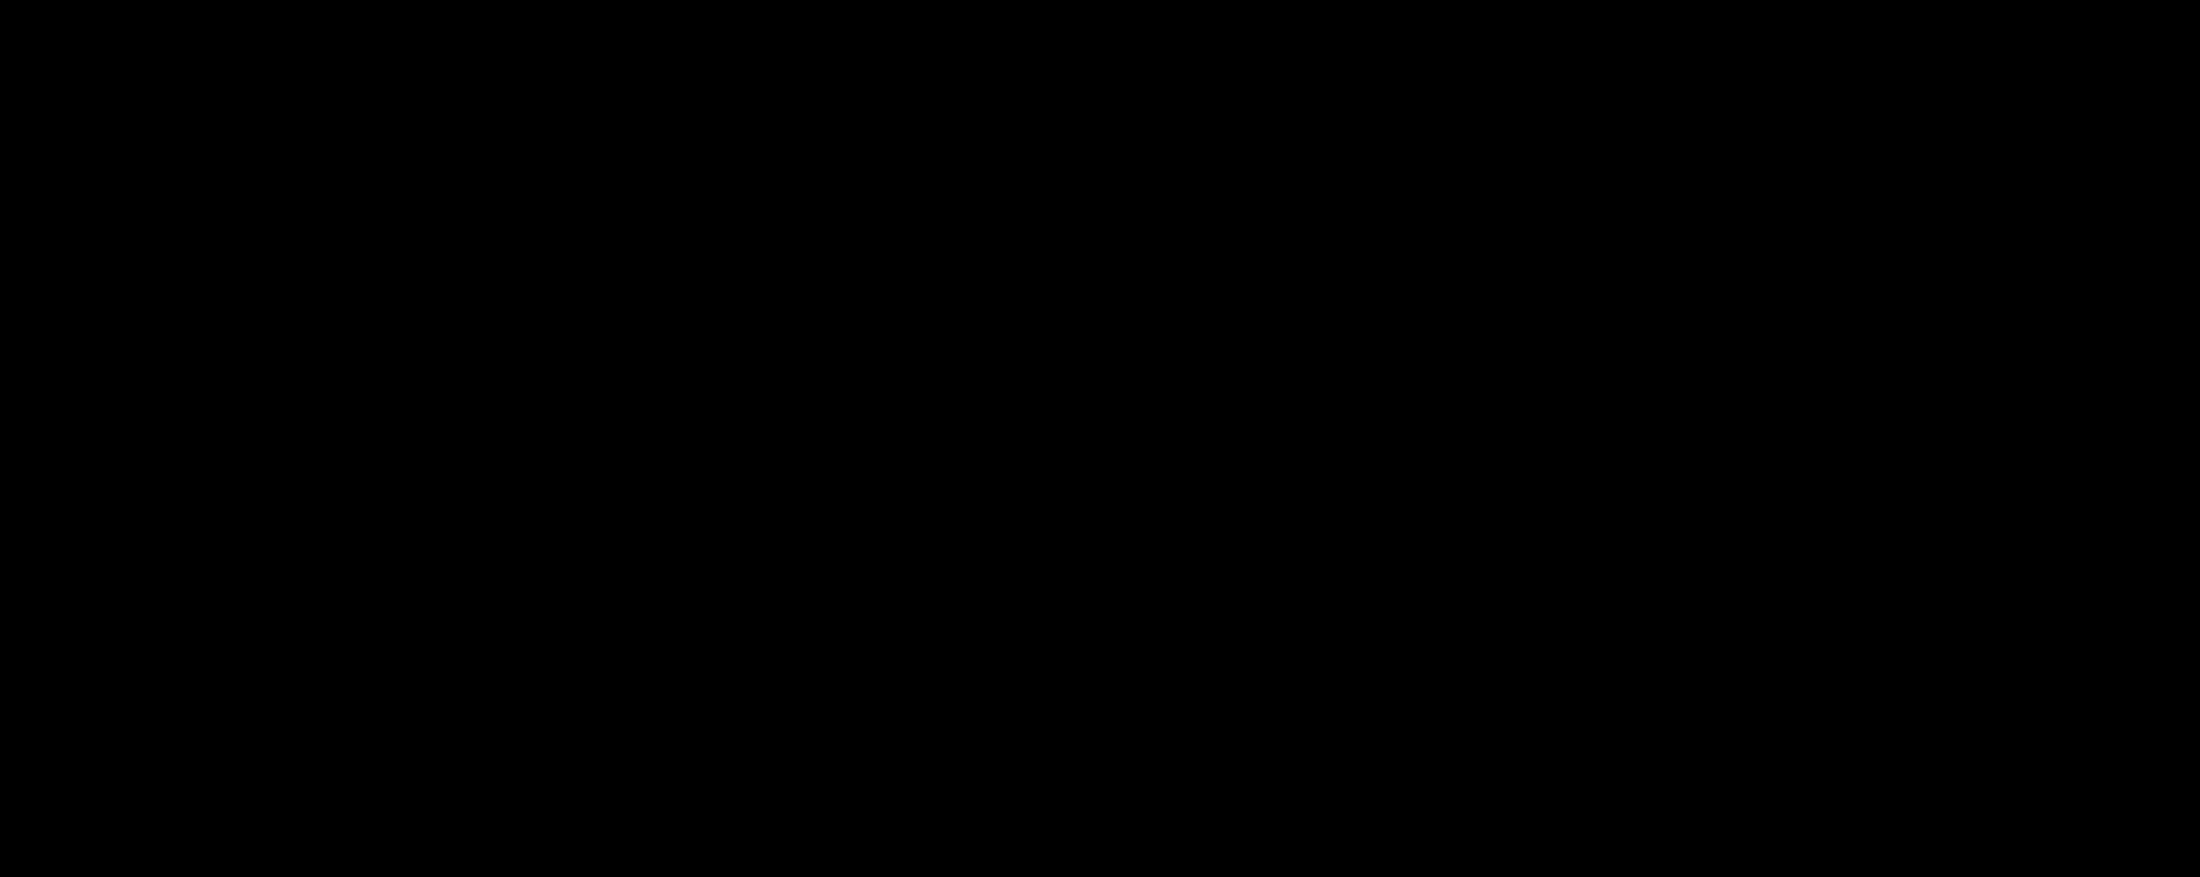 Domaine les crayeres official site luxury hotel reims - Restaurant le jardin reims crayeres ...